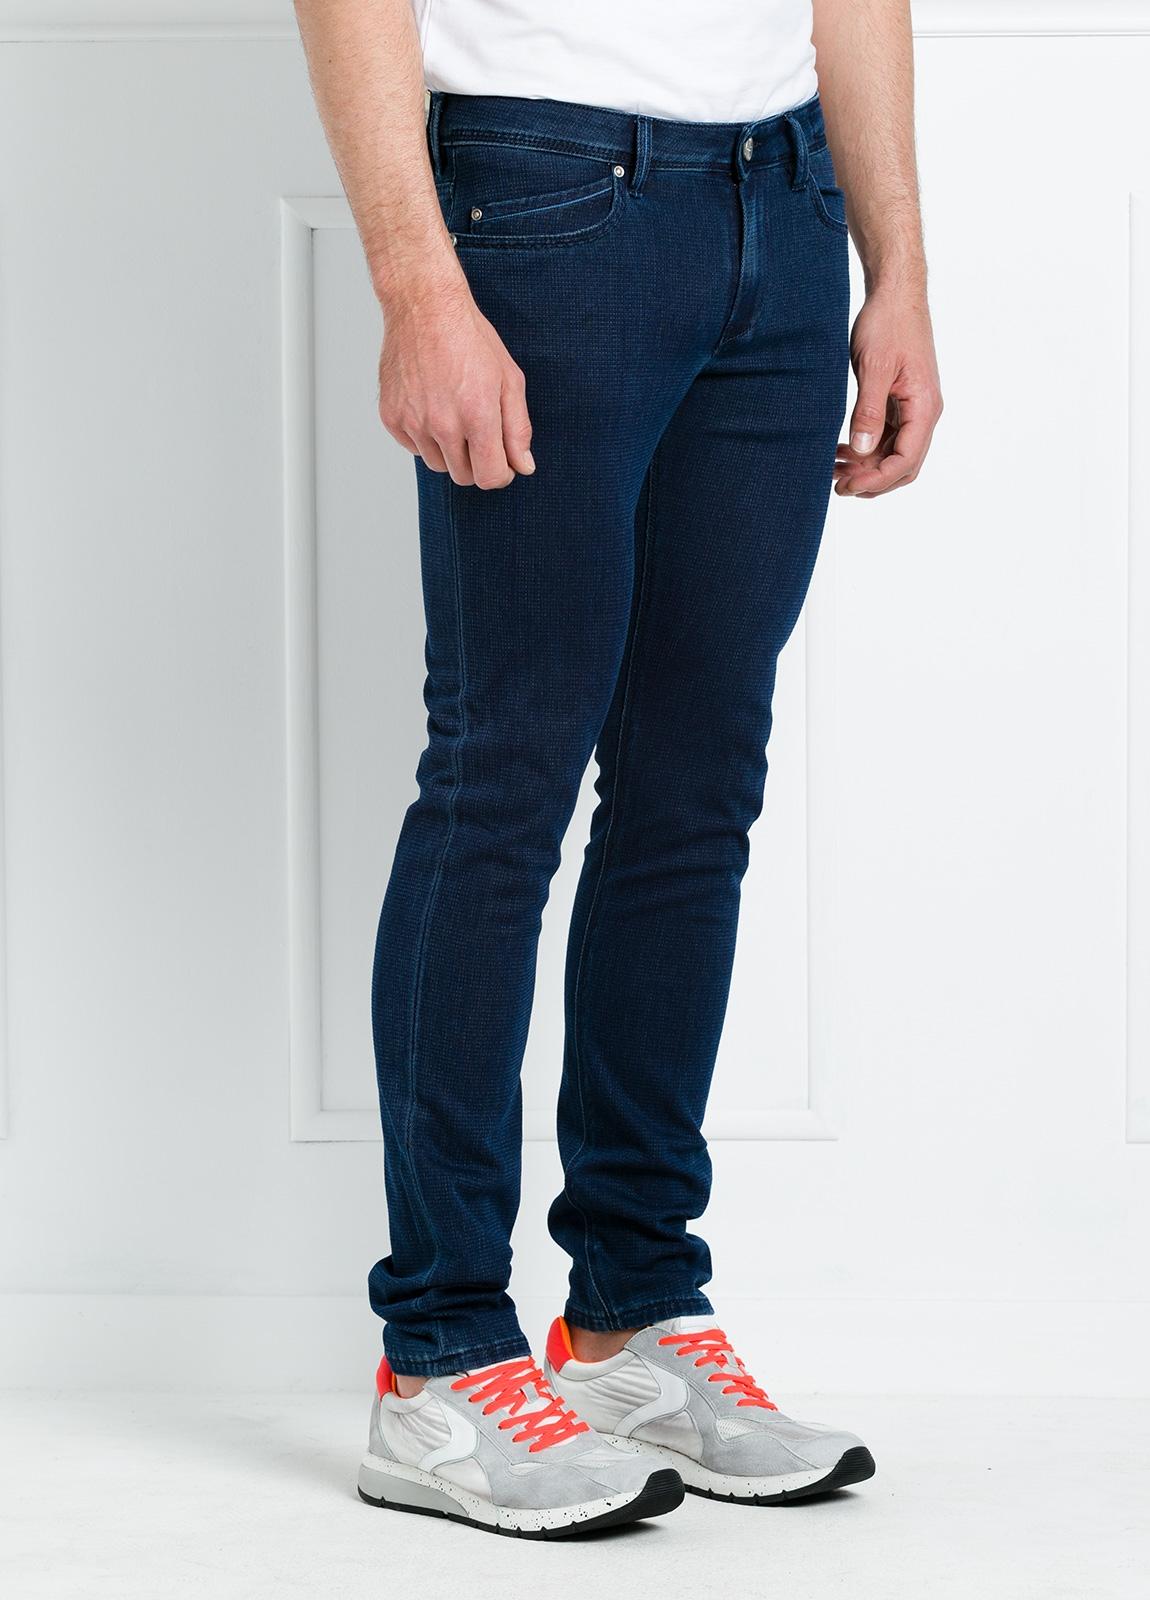 Pantalón sport slim fit modelo RUBENS P015 color azul oscuro. 57% Algodón 40% Poliéster 3% Elastáno. - Ítem3